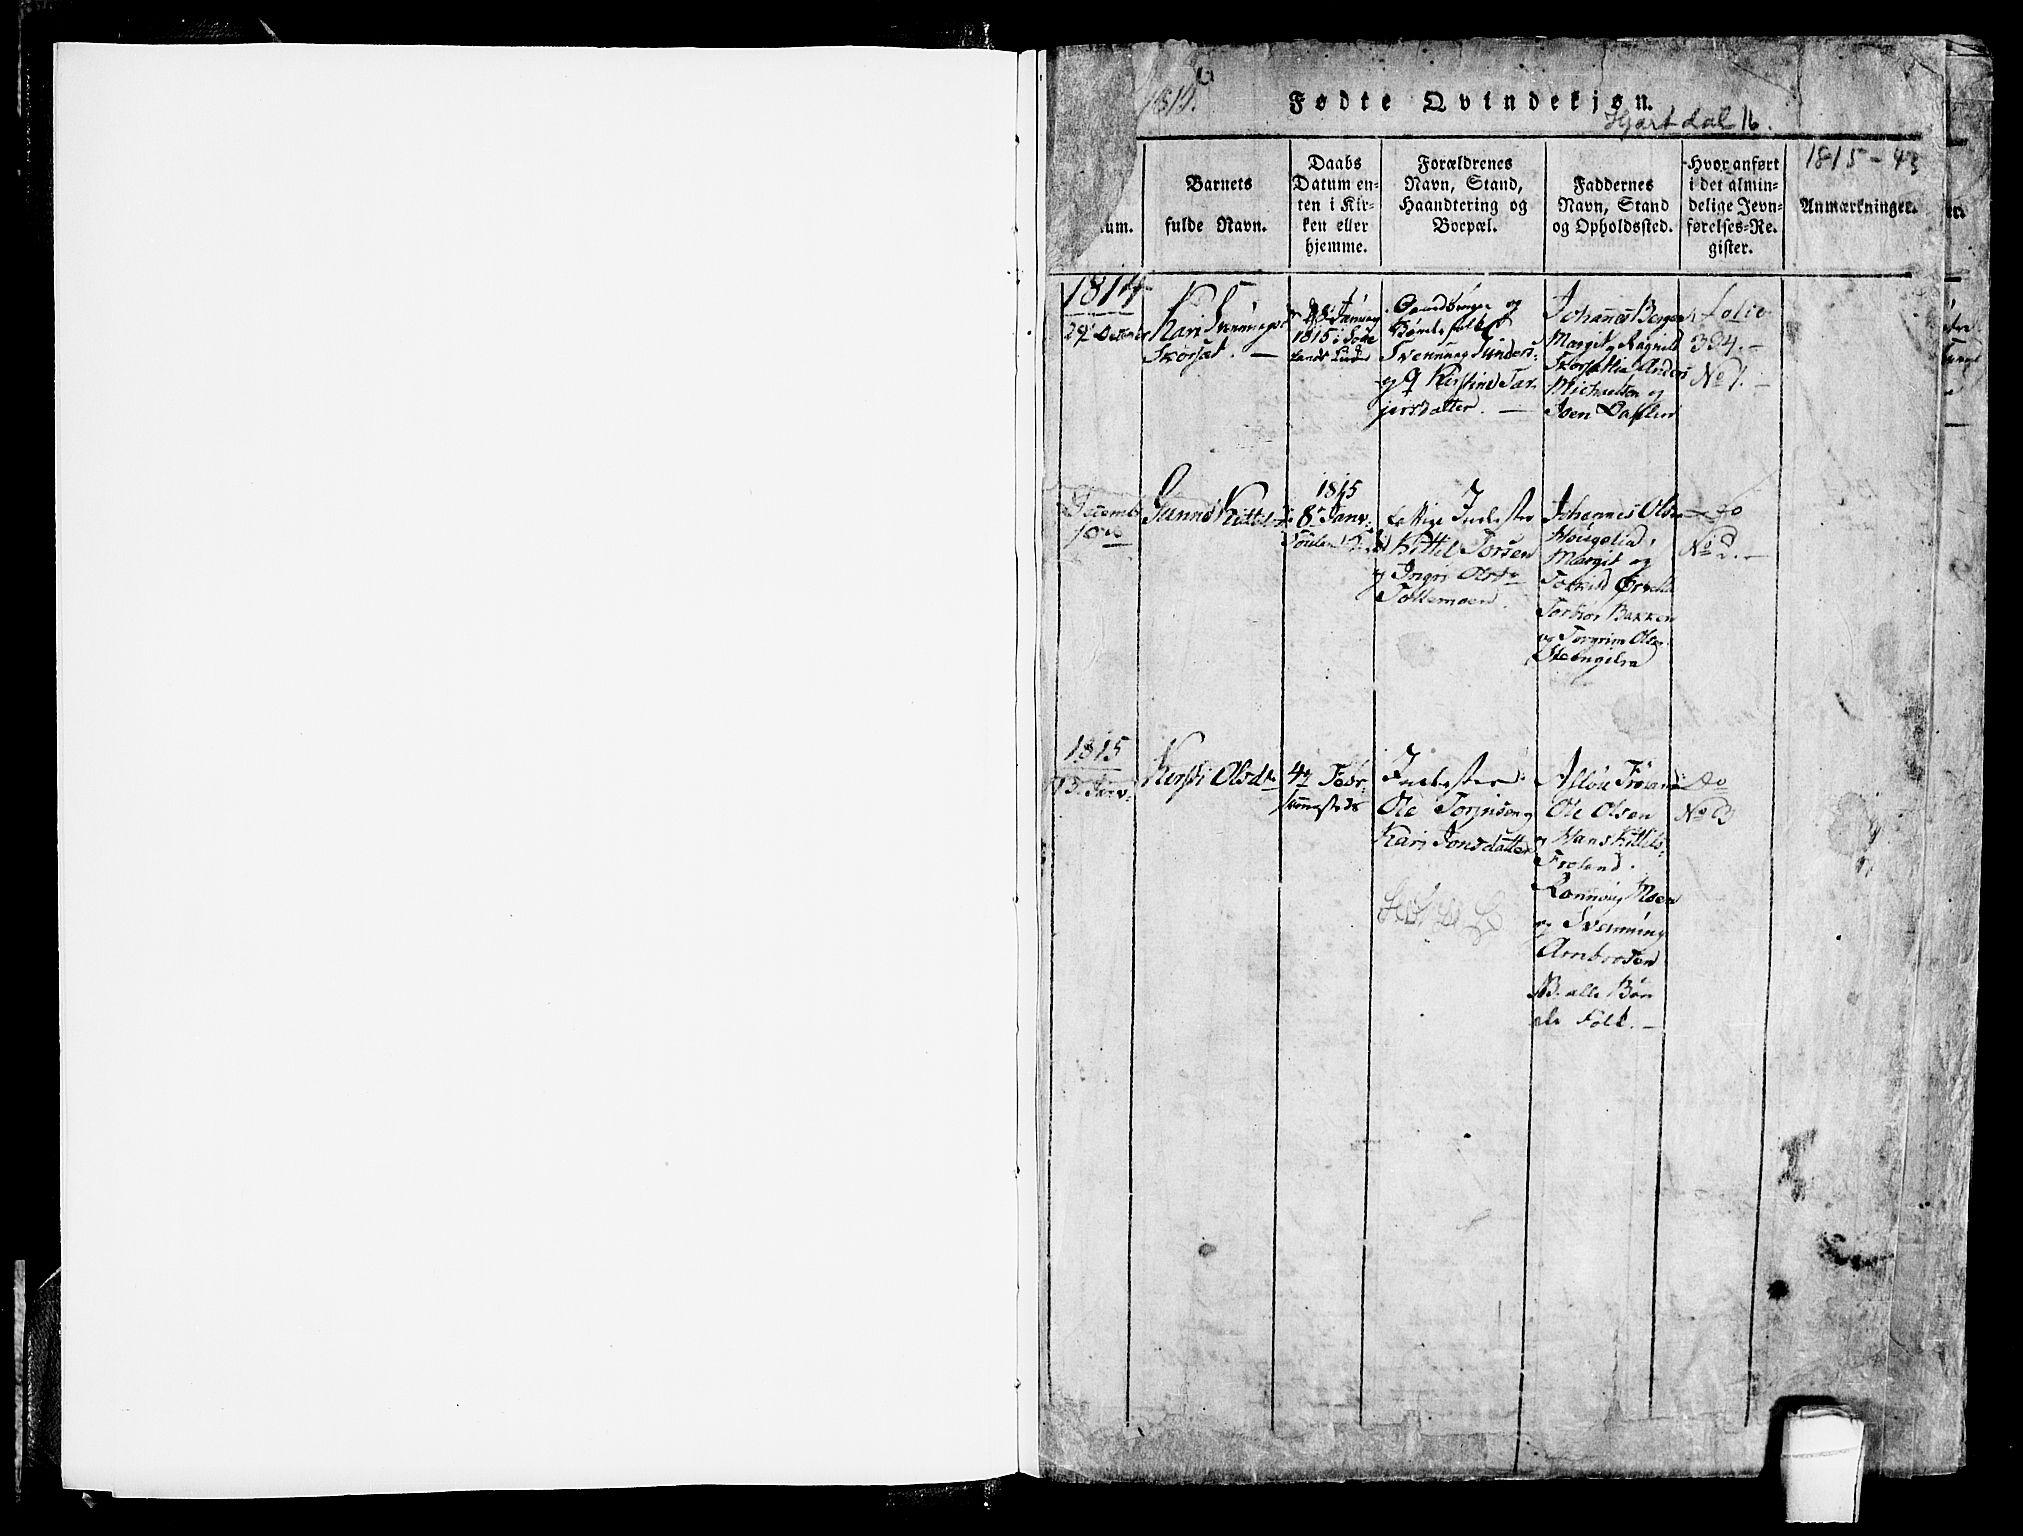 SAKO, Hjartdal kirkebøker, F/Fb/L0001: Ministerialbok nr. II 1, 1815-1843, s. 1